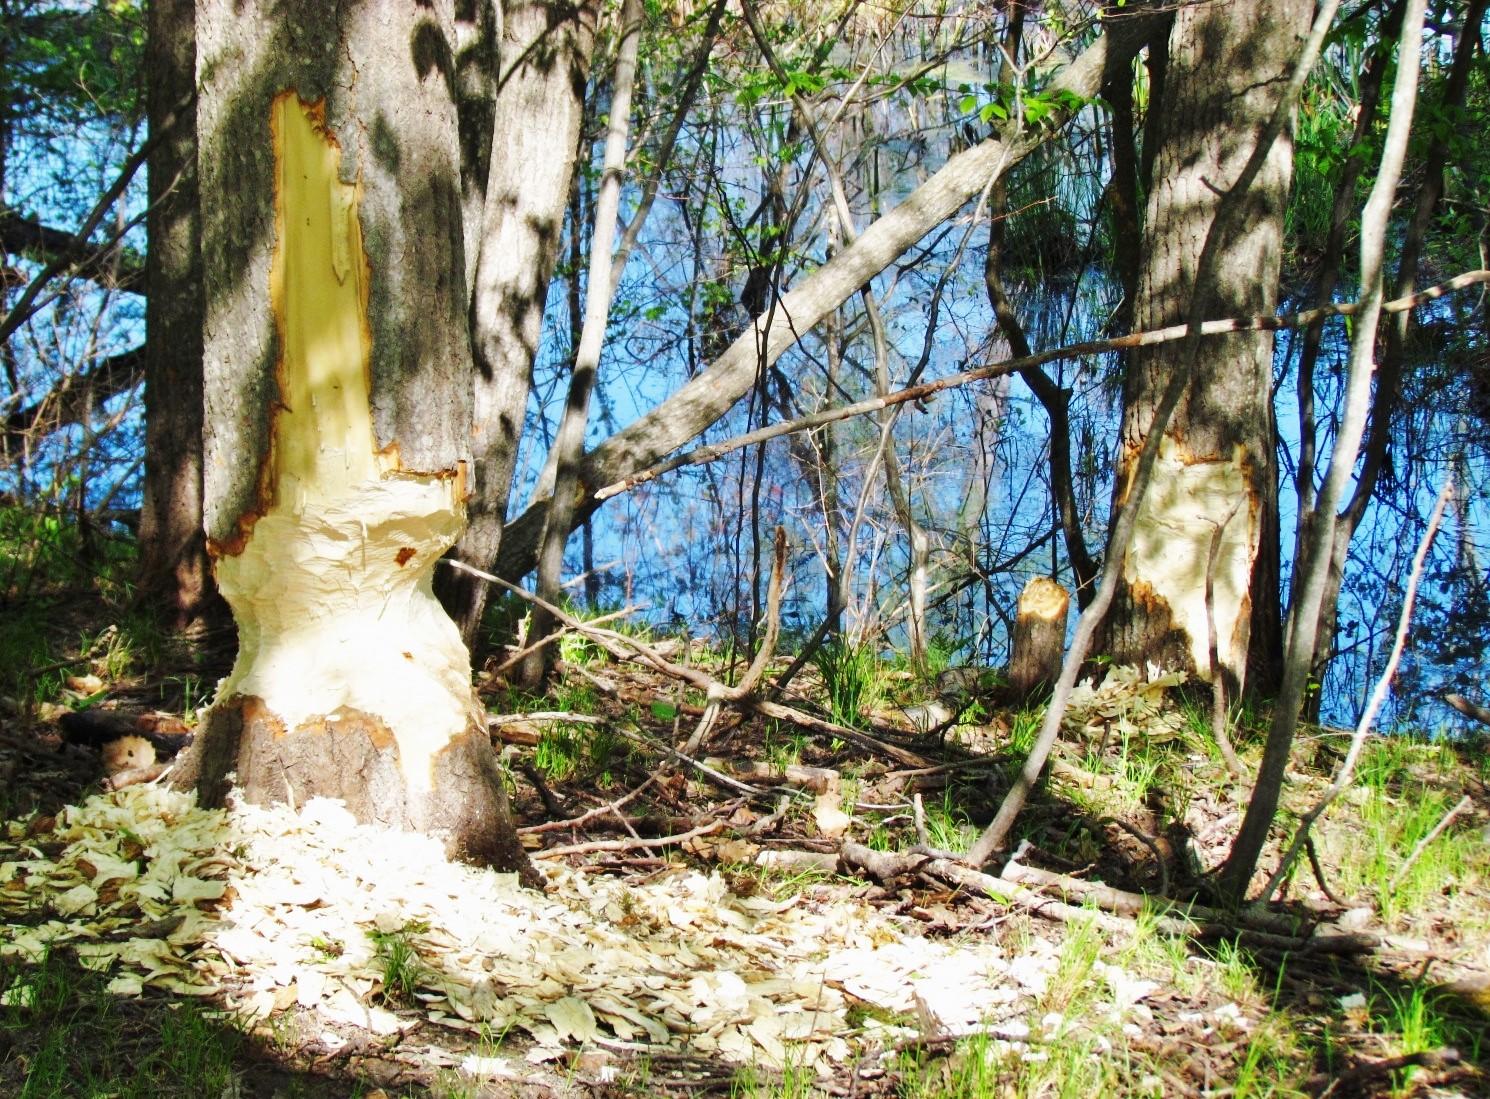 spring time beaver gnawing